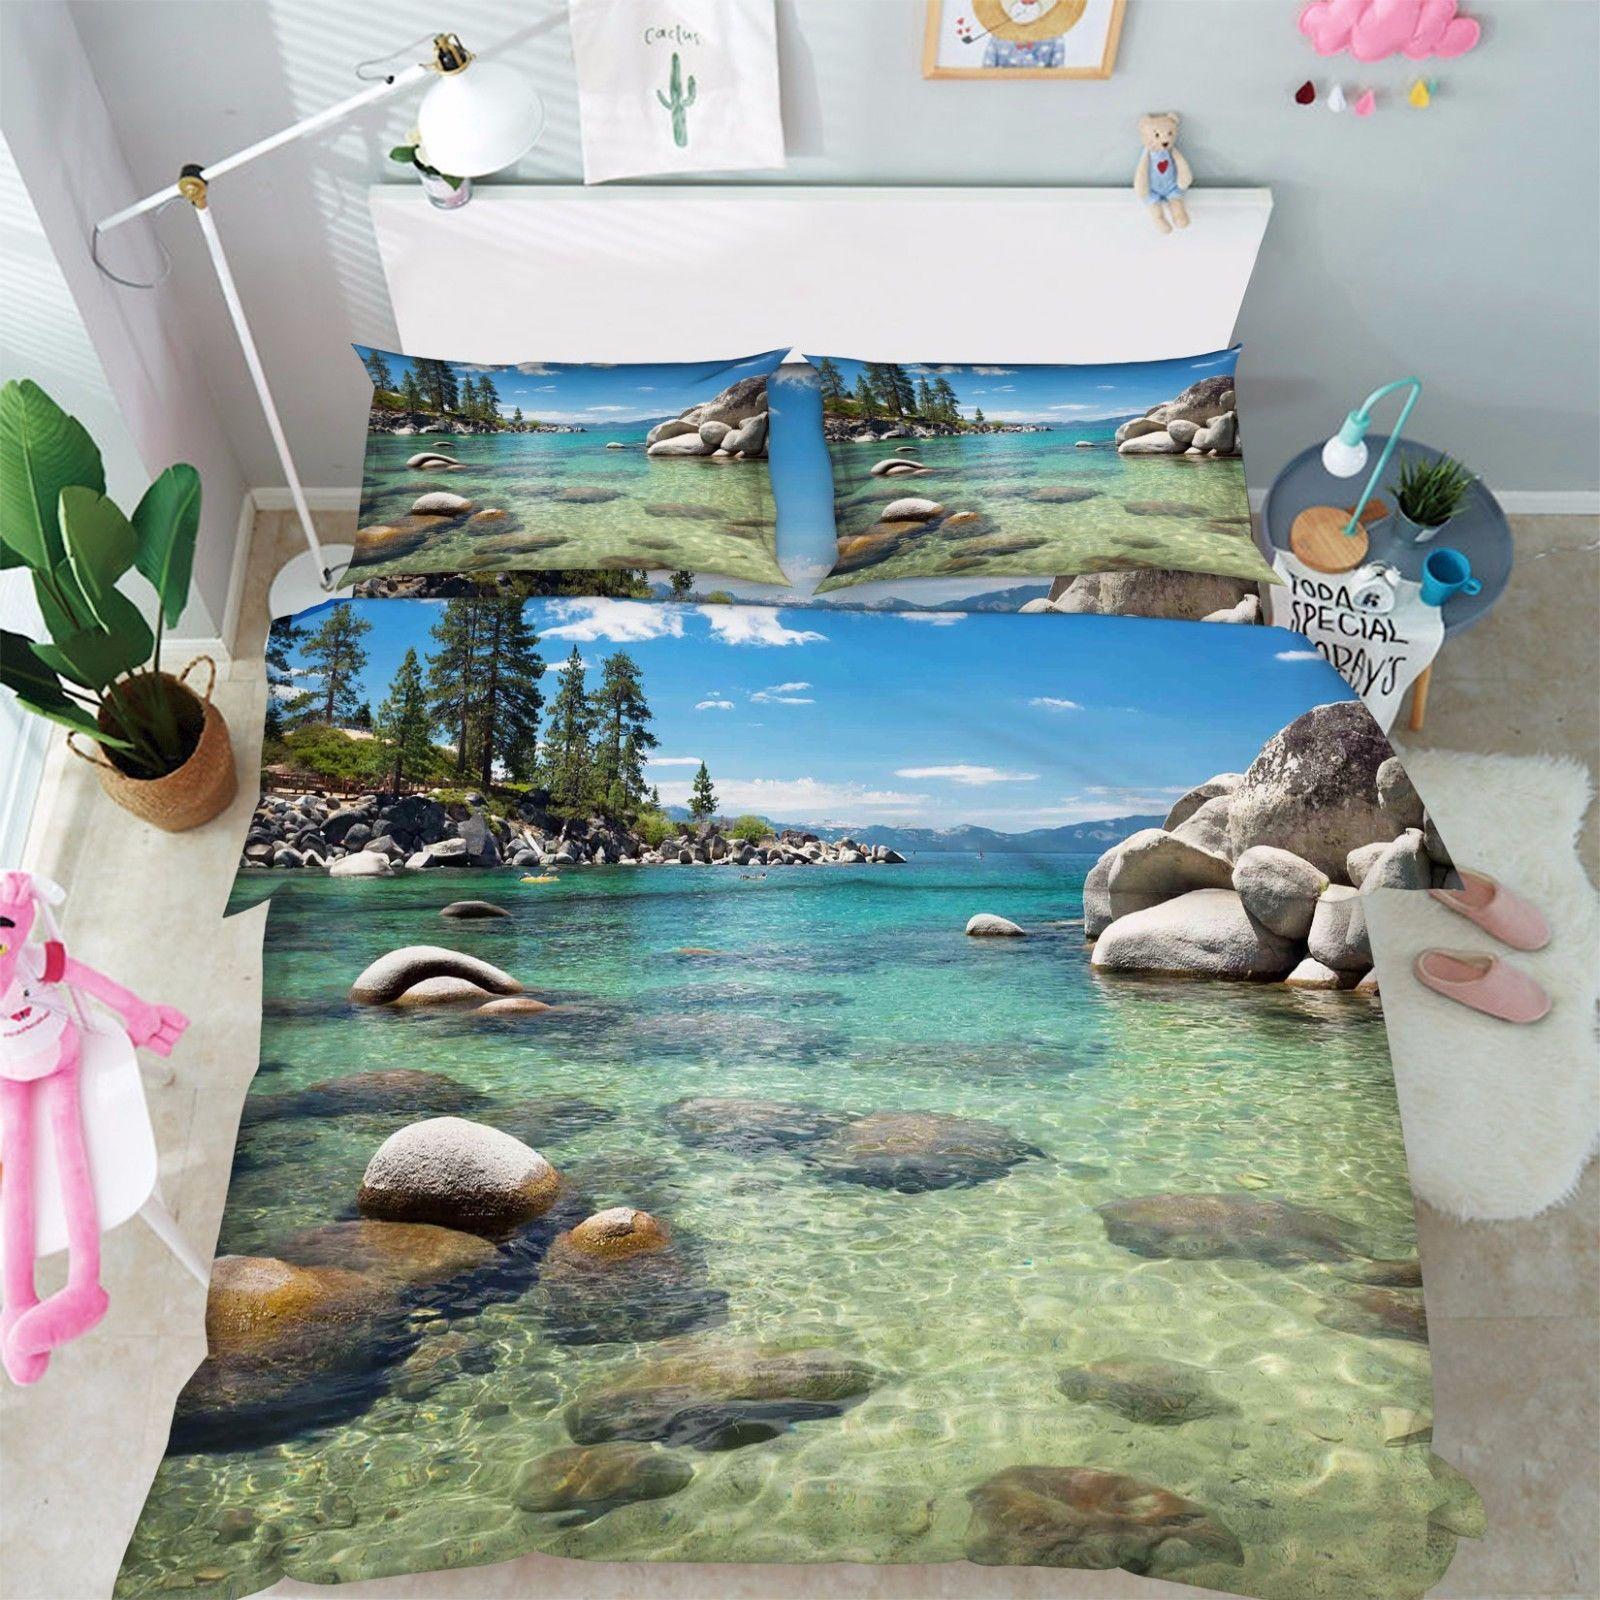 3D Sea Bay Stone Bed Pillowcases Quilt Duvet Cover Set Single Queen King Size AU - $64.32 - $96.47